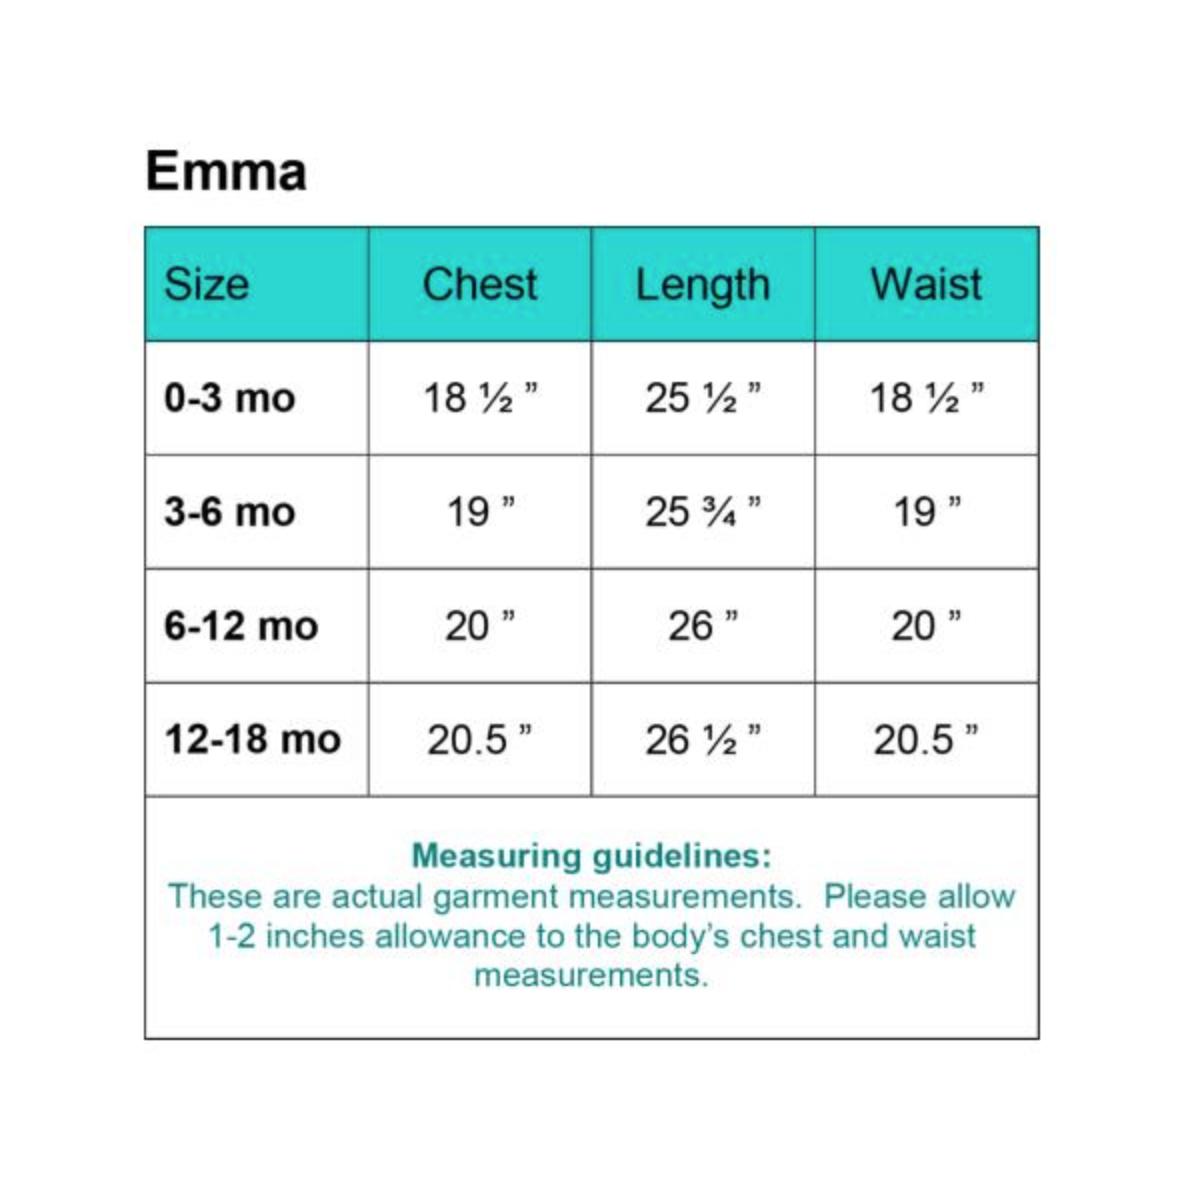 sizing-chart-emma.png